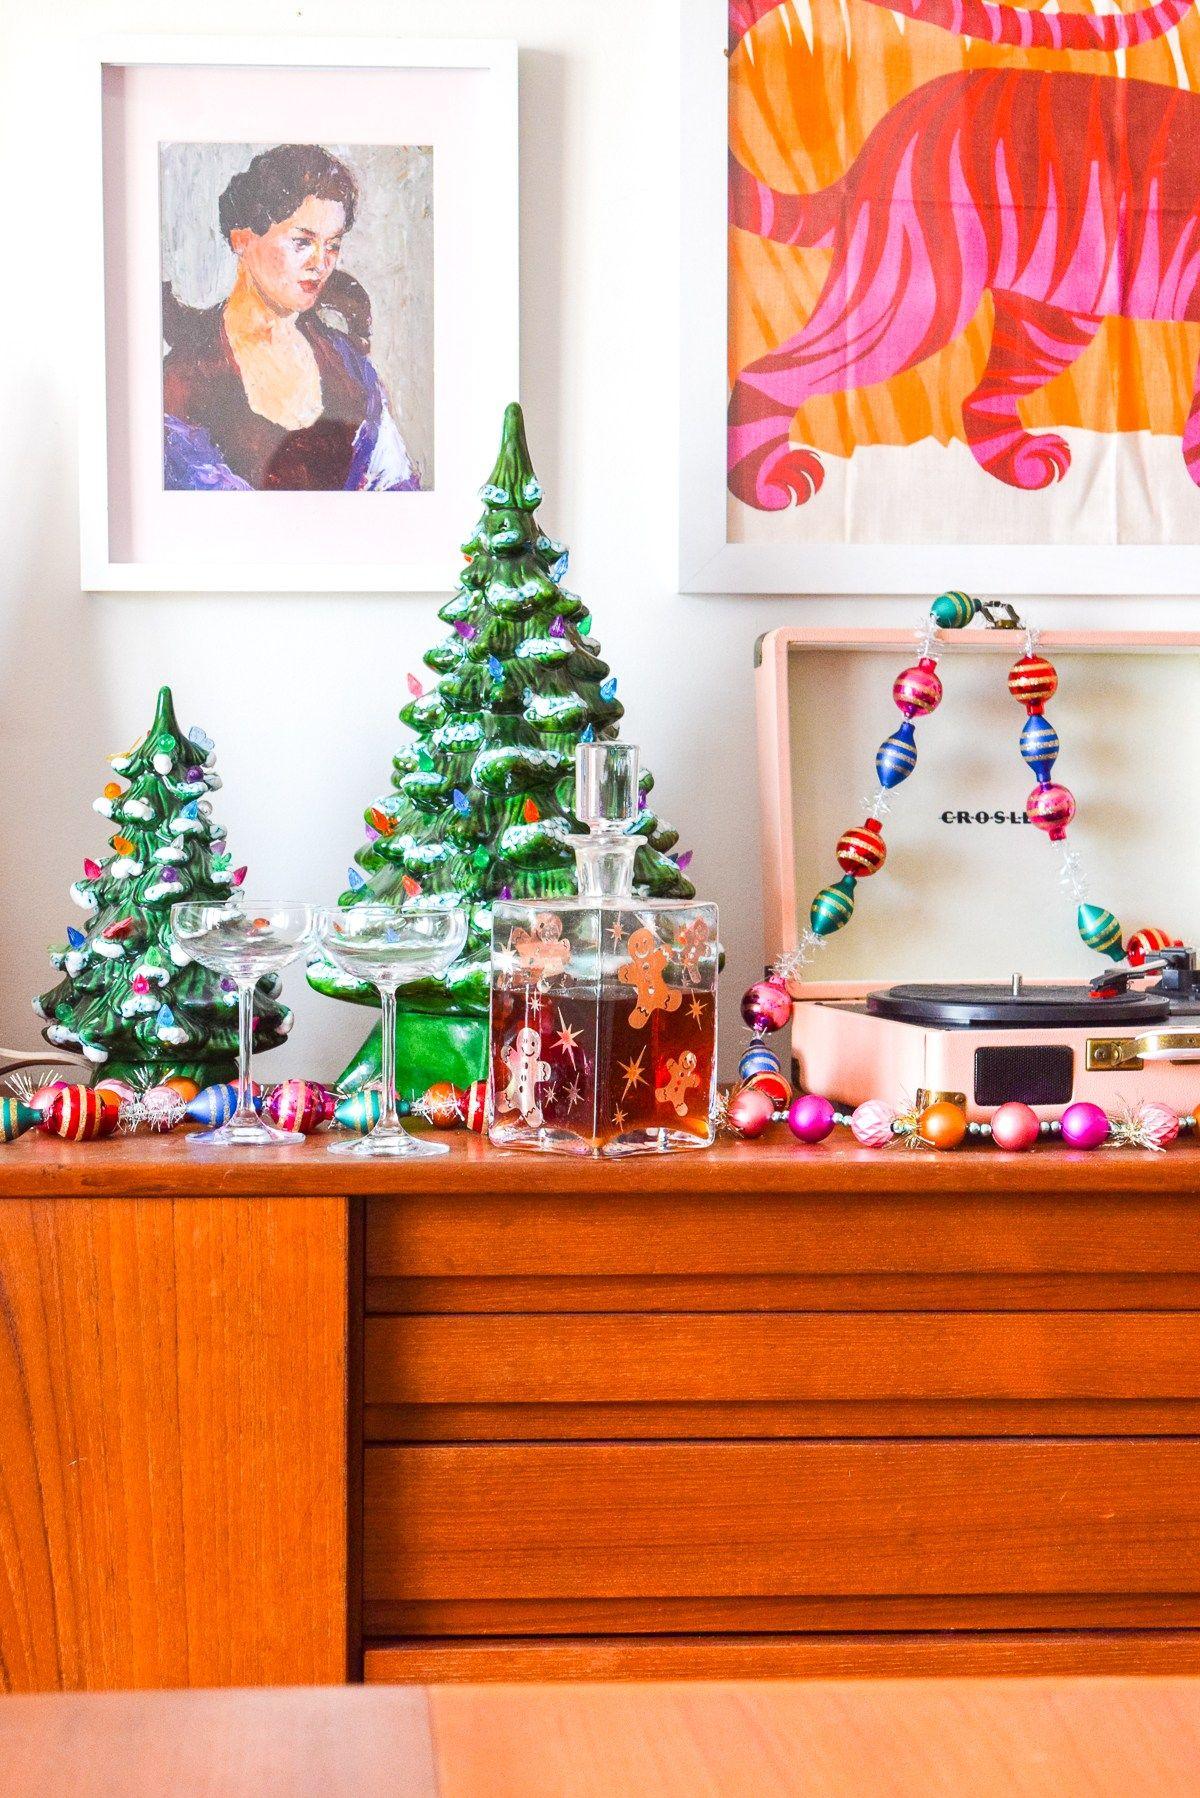 Ceramic Christmas Tree Sideboard Display (With images)   Ceramic christmas trees, Retro ...